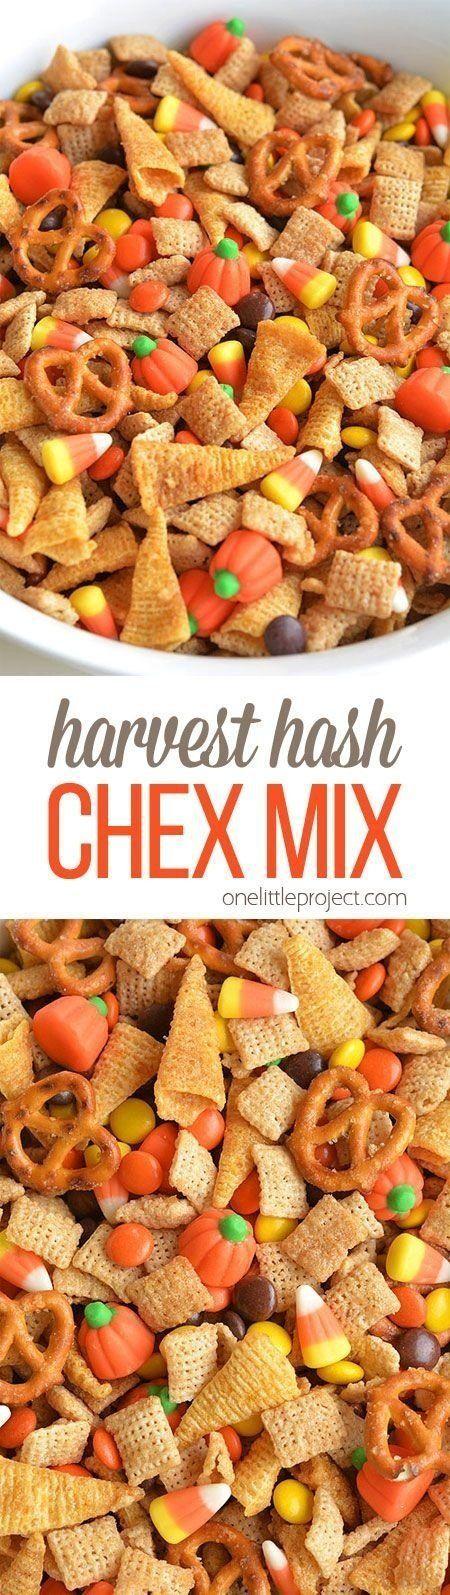 Ernte Hash Trail Mix   – Autumn – #Autumn #Ernte #Hash #Mix #Trail  – Studentenf…